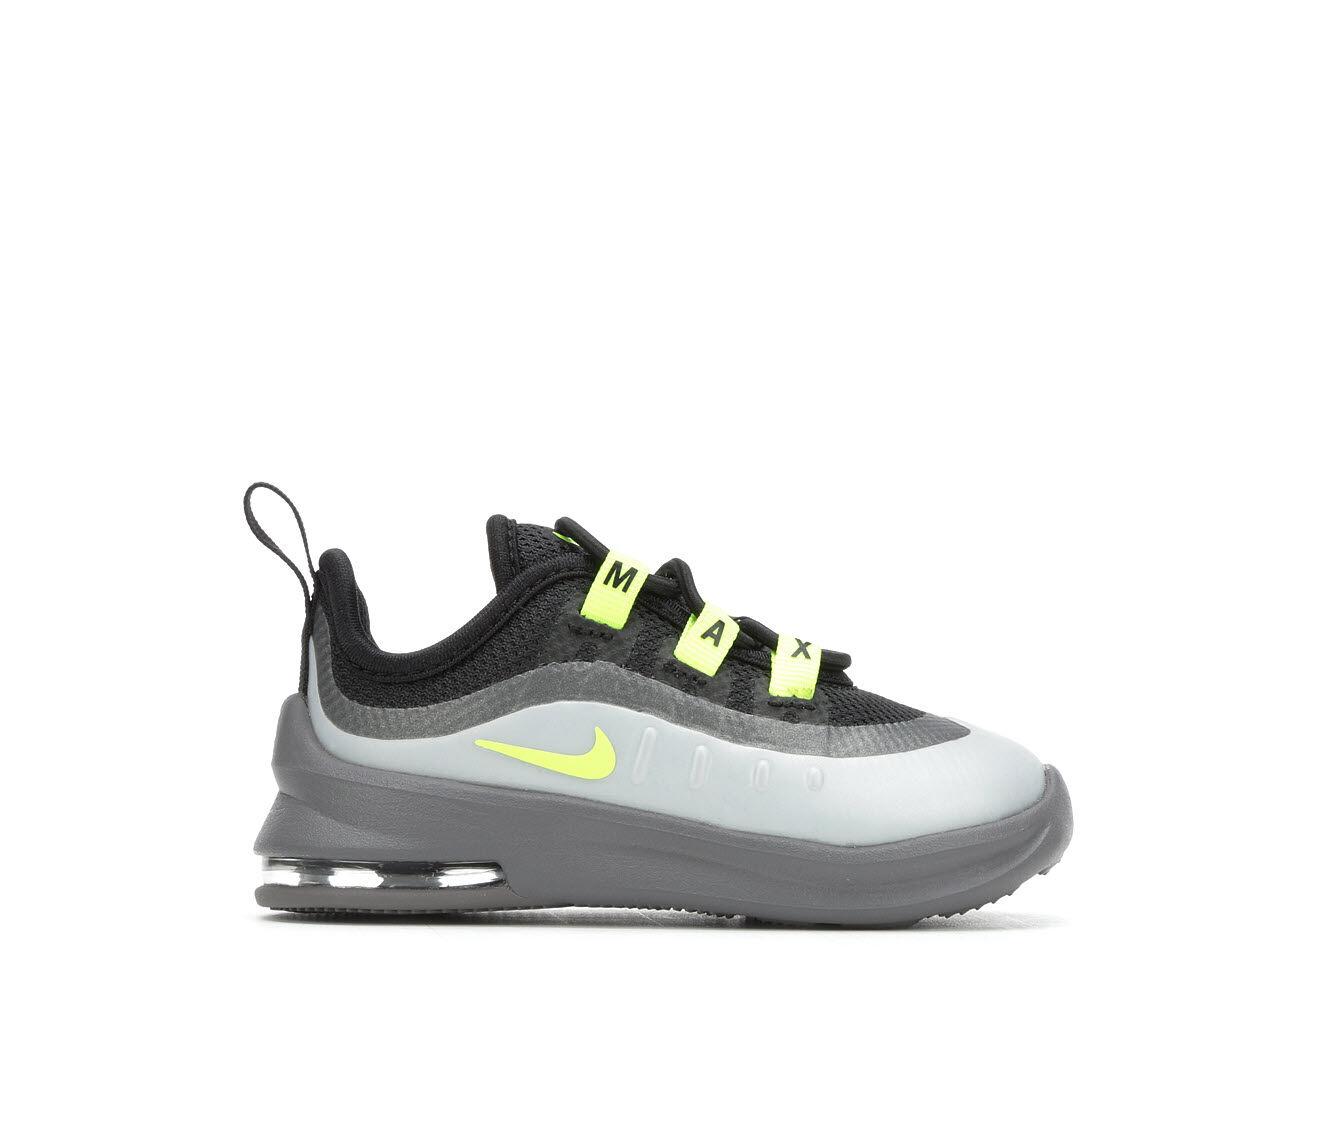 Boys' Nike Infant \u0026 Toddler Air Max